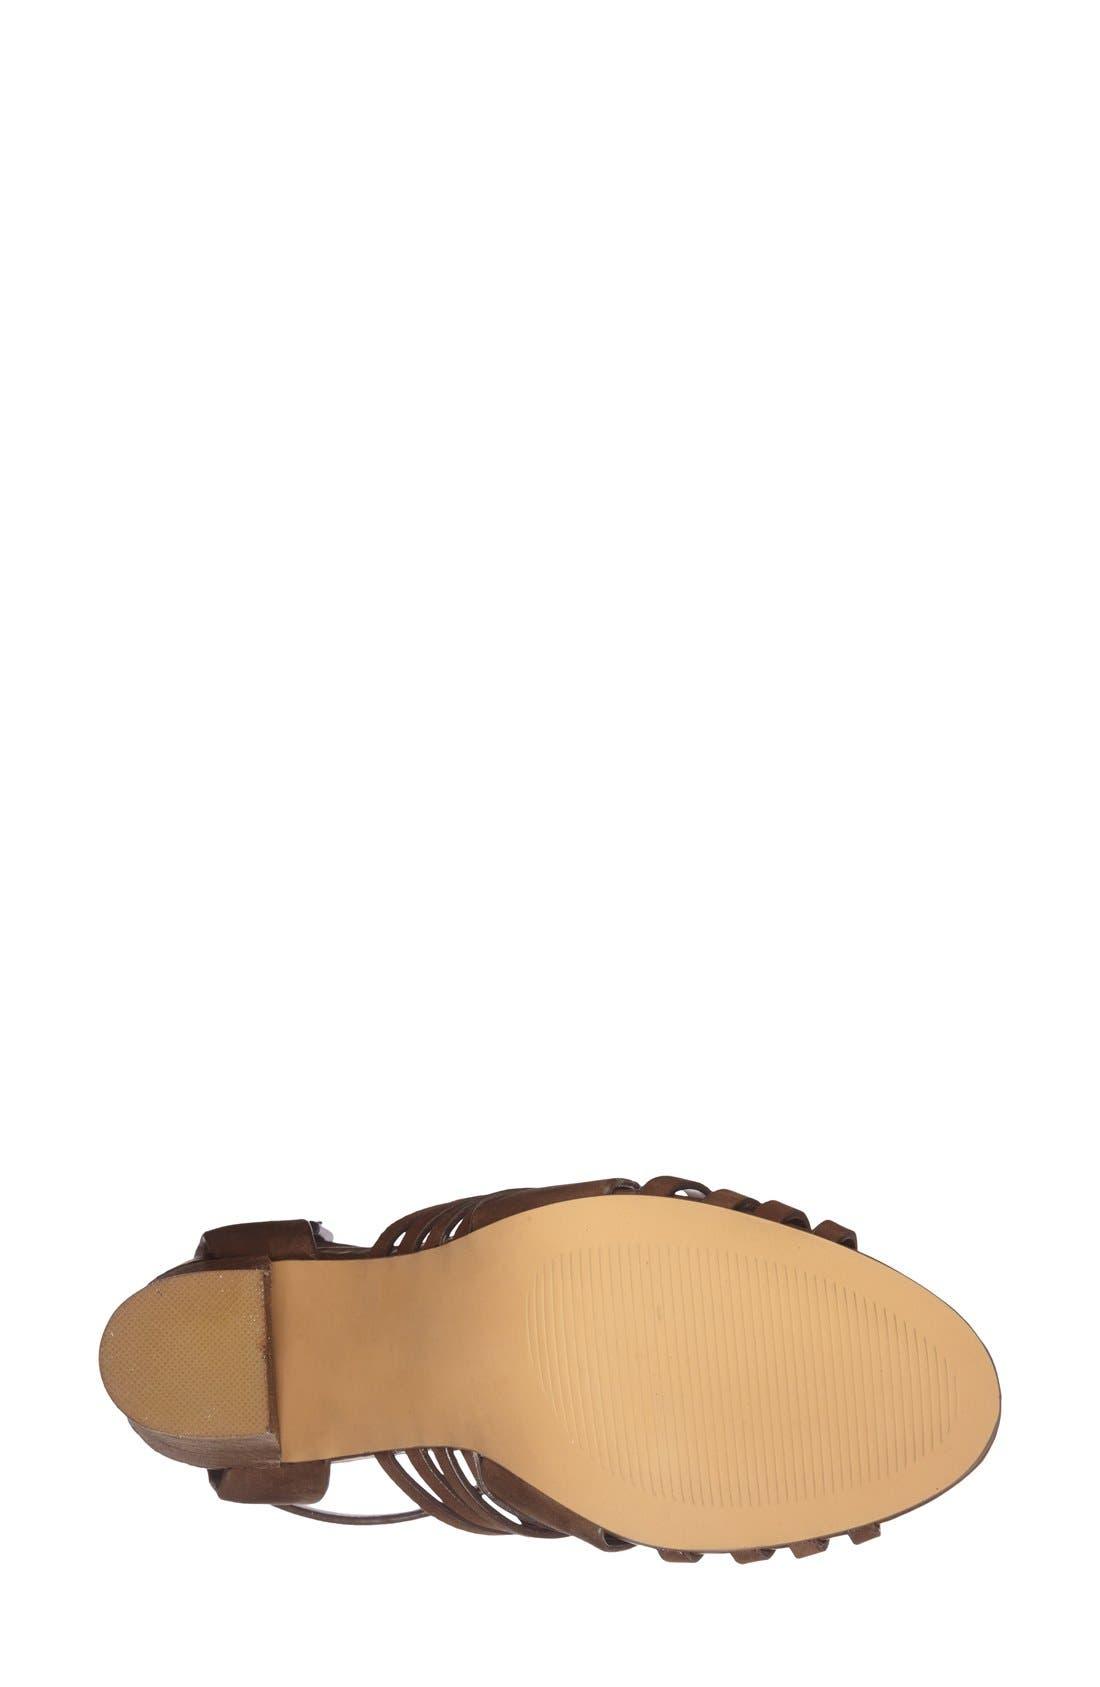 'Sandrina' Huarache Sandal,                             Alternate thumbnail 4, color,                             Brown Leather